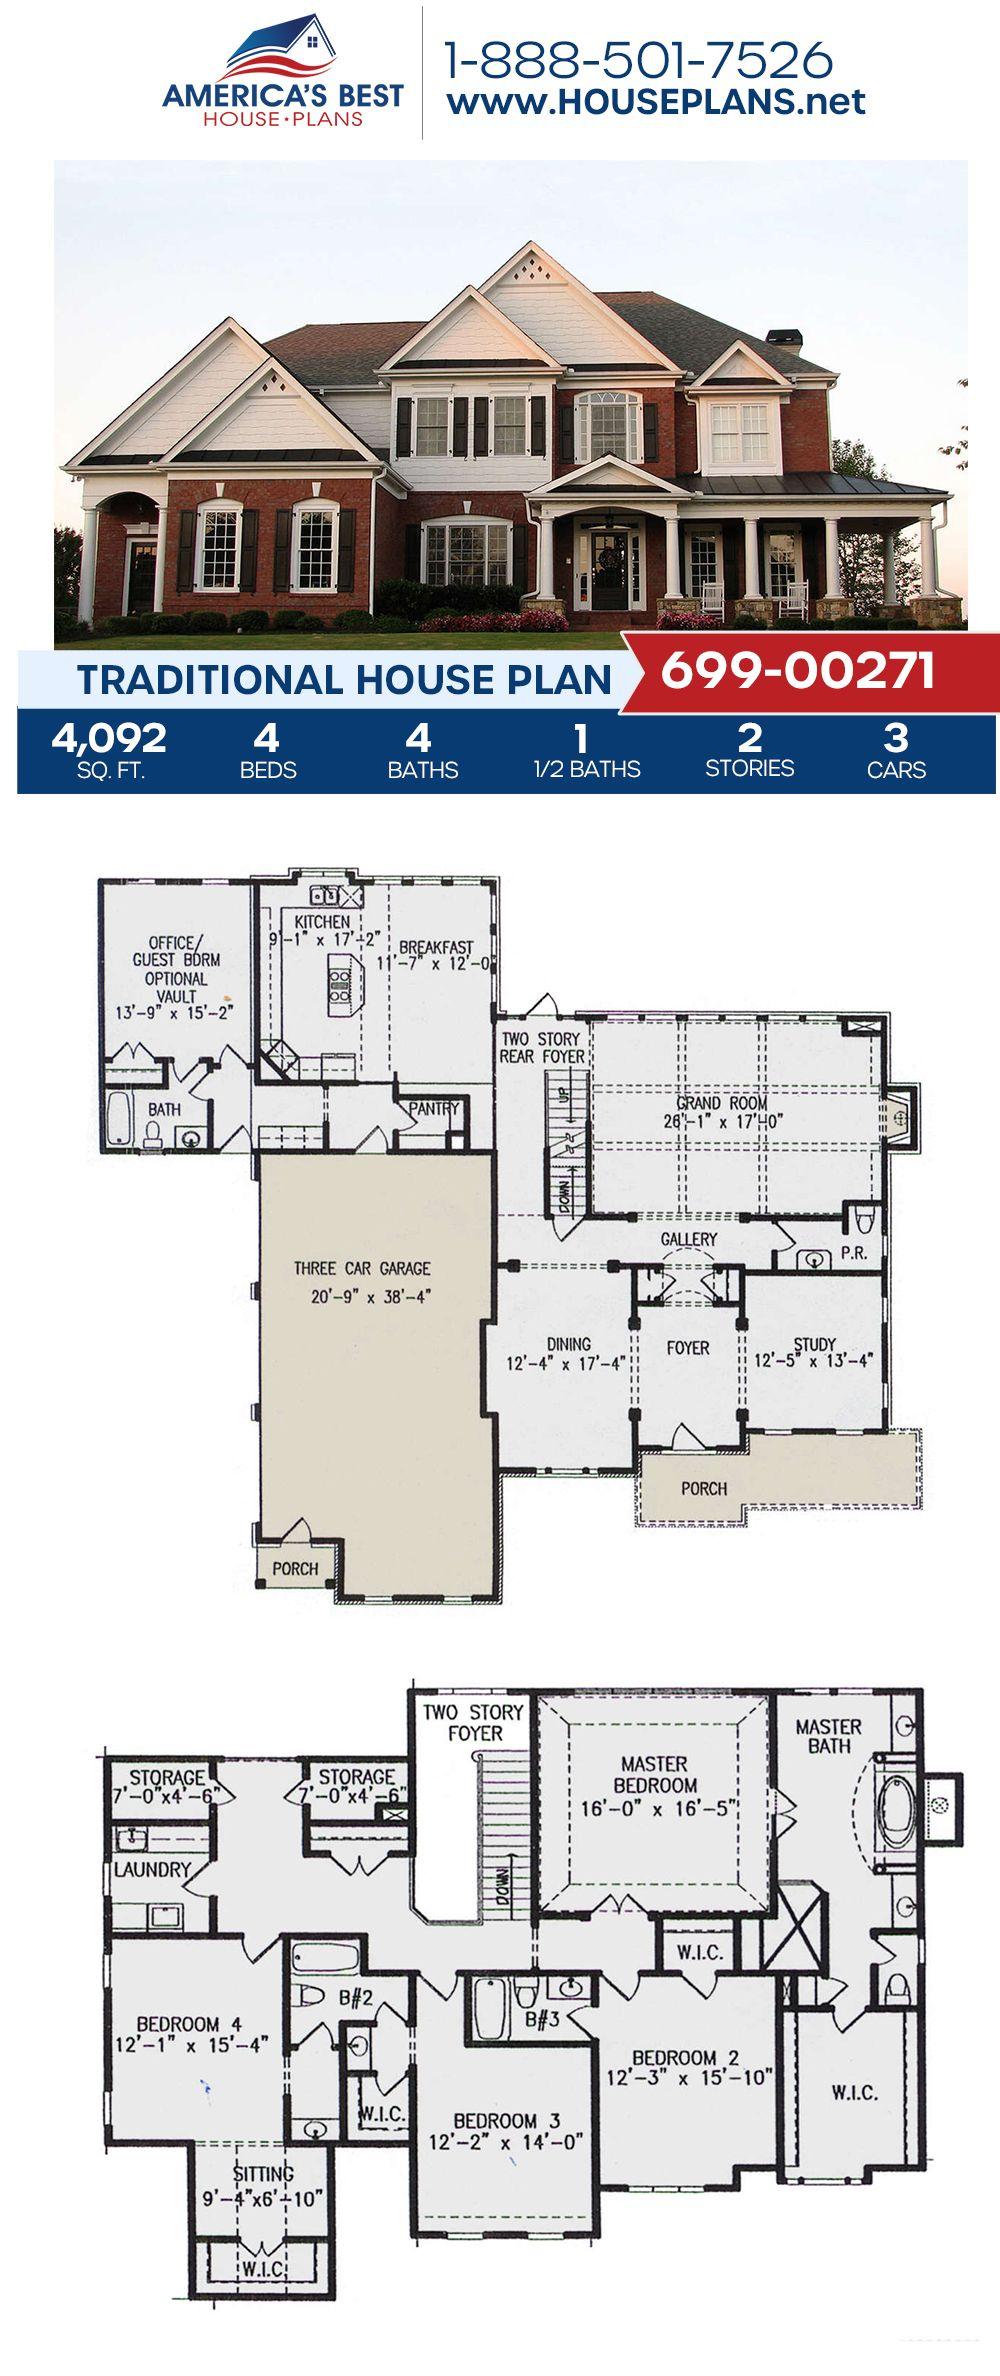 House Plan 699 00271 Traditional Plan 4 092 Square Feet 4 Bedrooms 4 5 Bathrooms In 2020 House Plans Dream House Plans Traditional House Plans